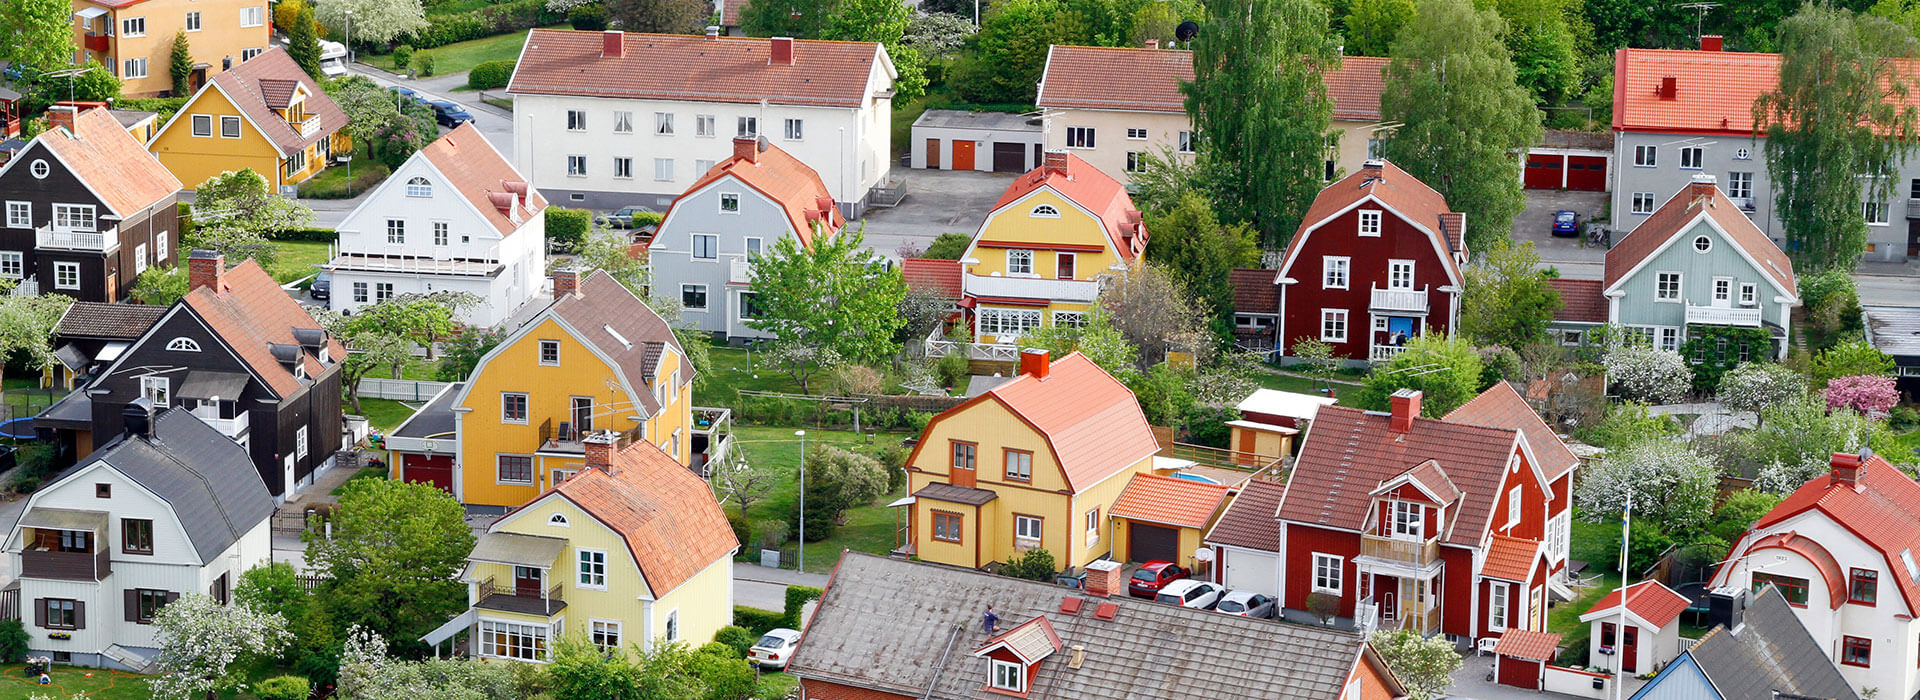 Villor i Sverige